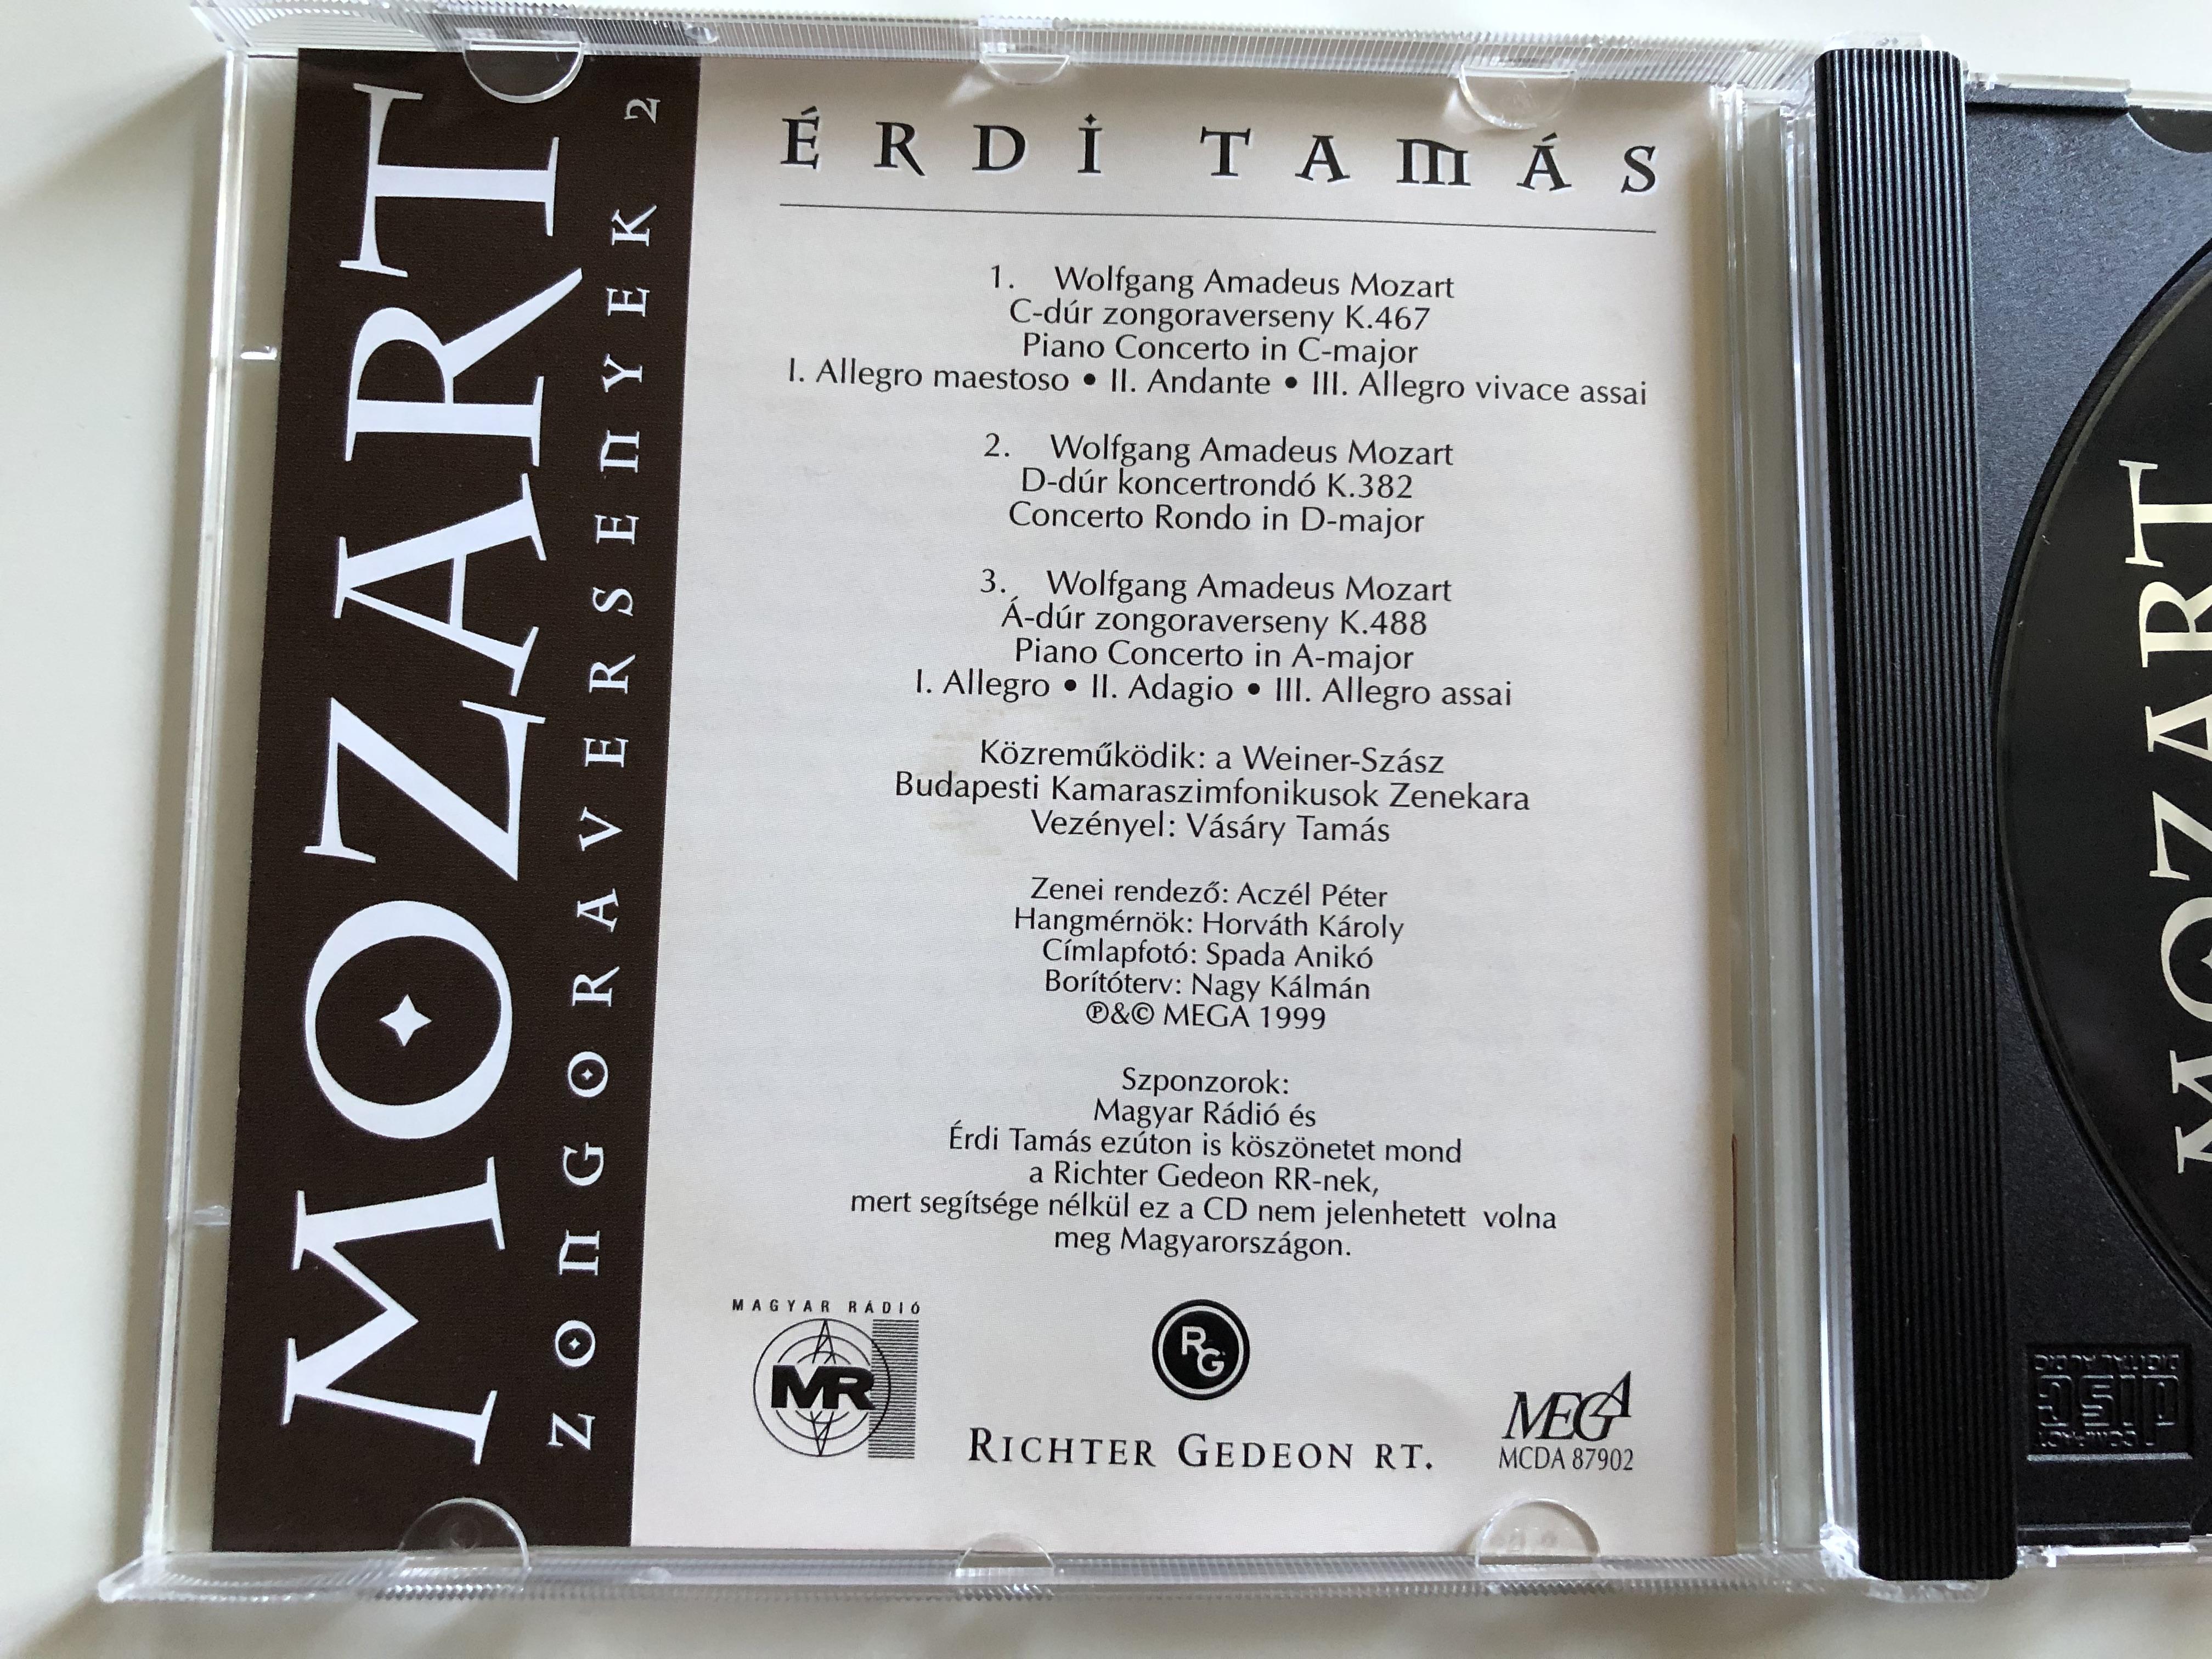 mozart-zongoraversenyek-2-erdi-tamas-mega-audio-cd-mcda-87902-8-.jpg